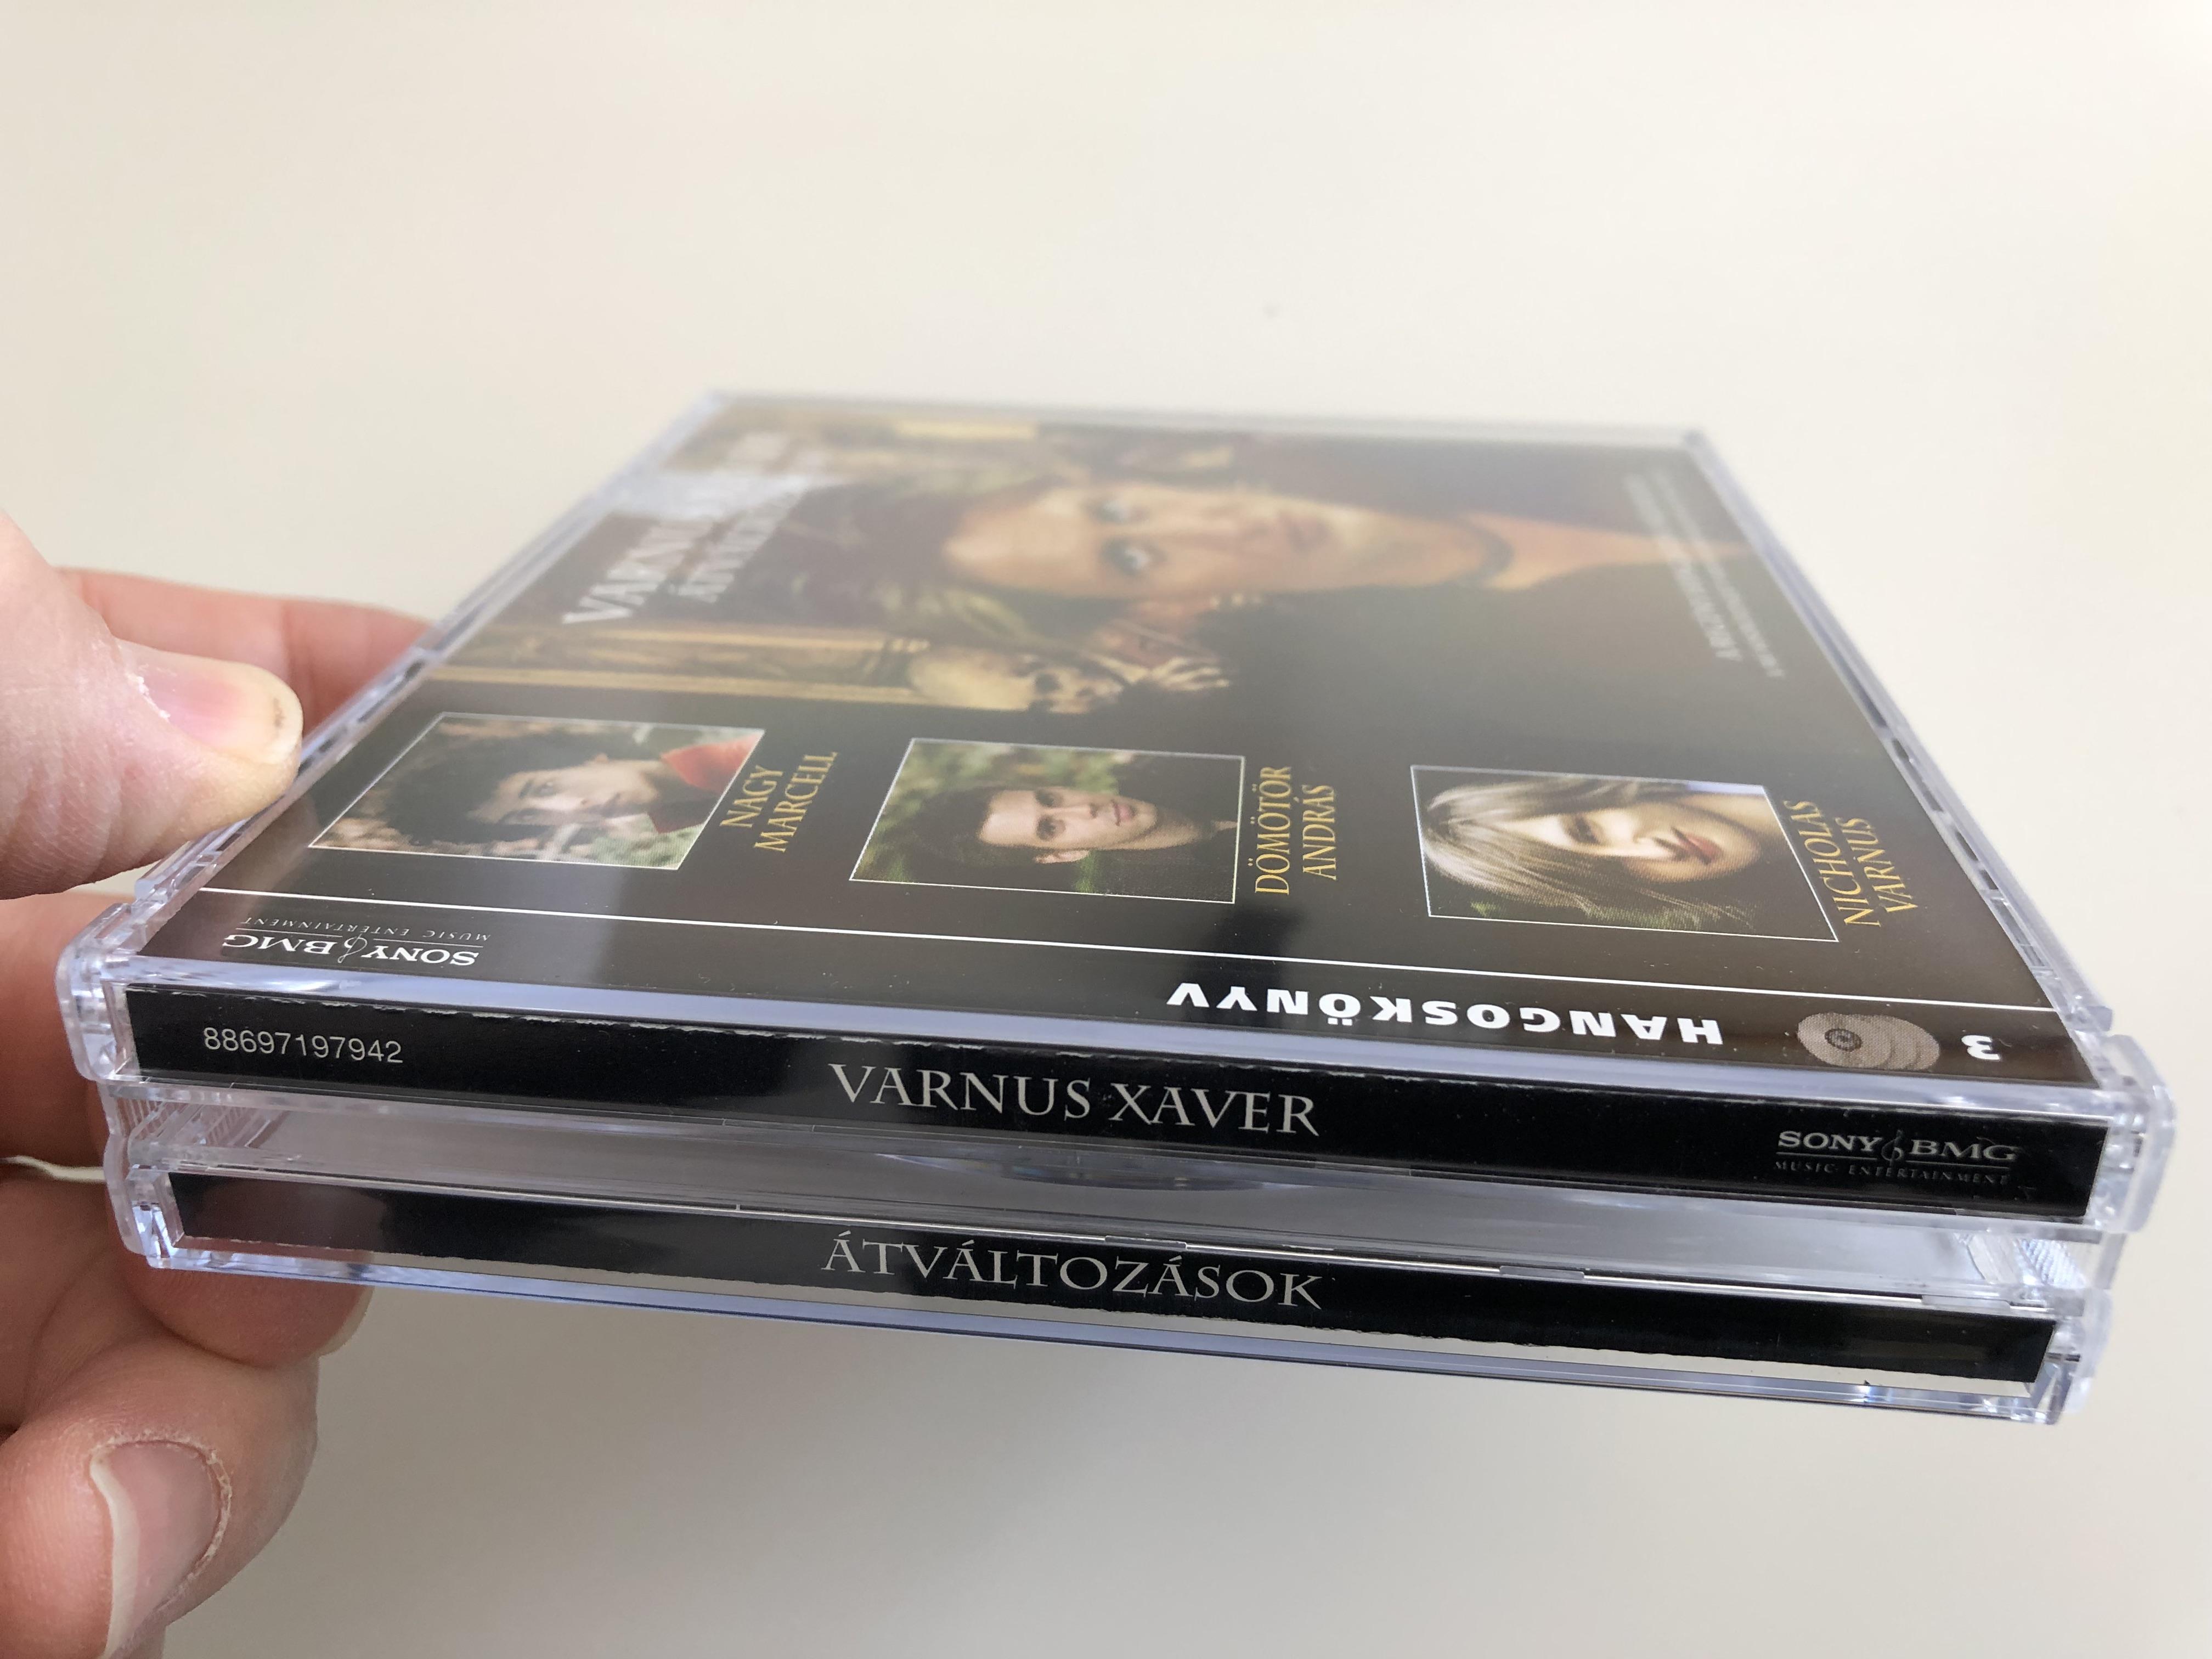 -tv-ltoz-sok-by-varnus-xaver-3-cd-audio-book-the-audio-version-of-the-novel-music-by-varnus-xaver-sony-music-entertainment-2003-6-.jpg